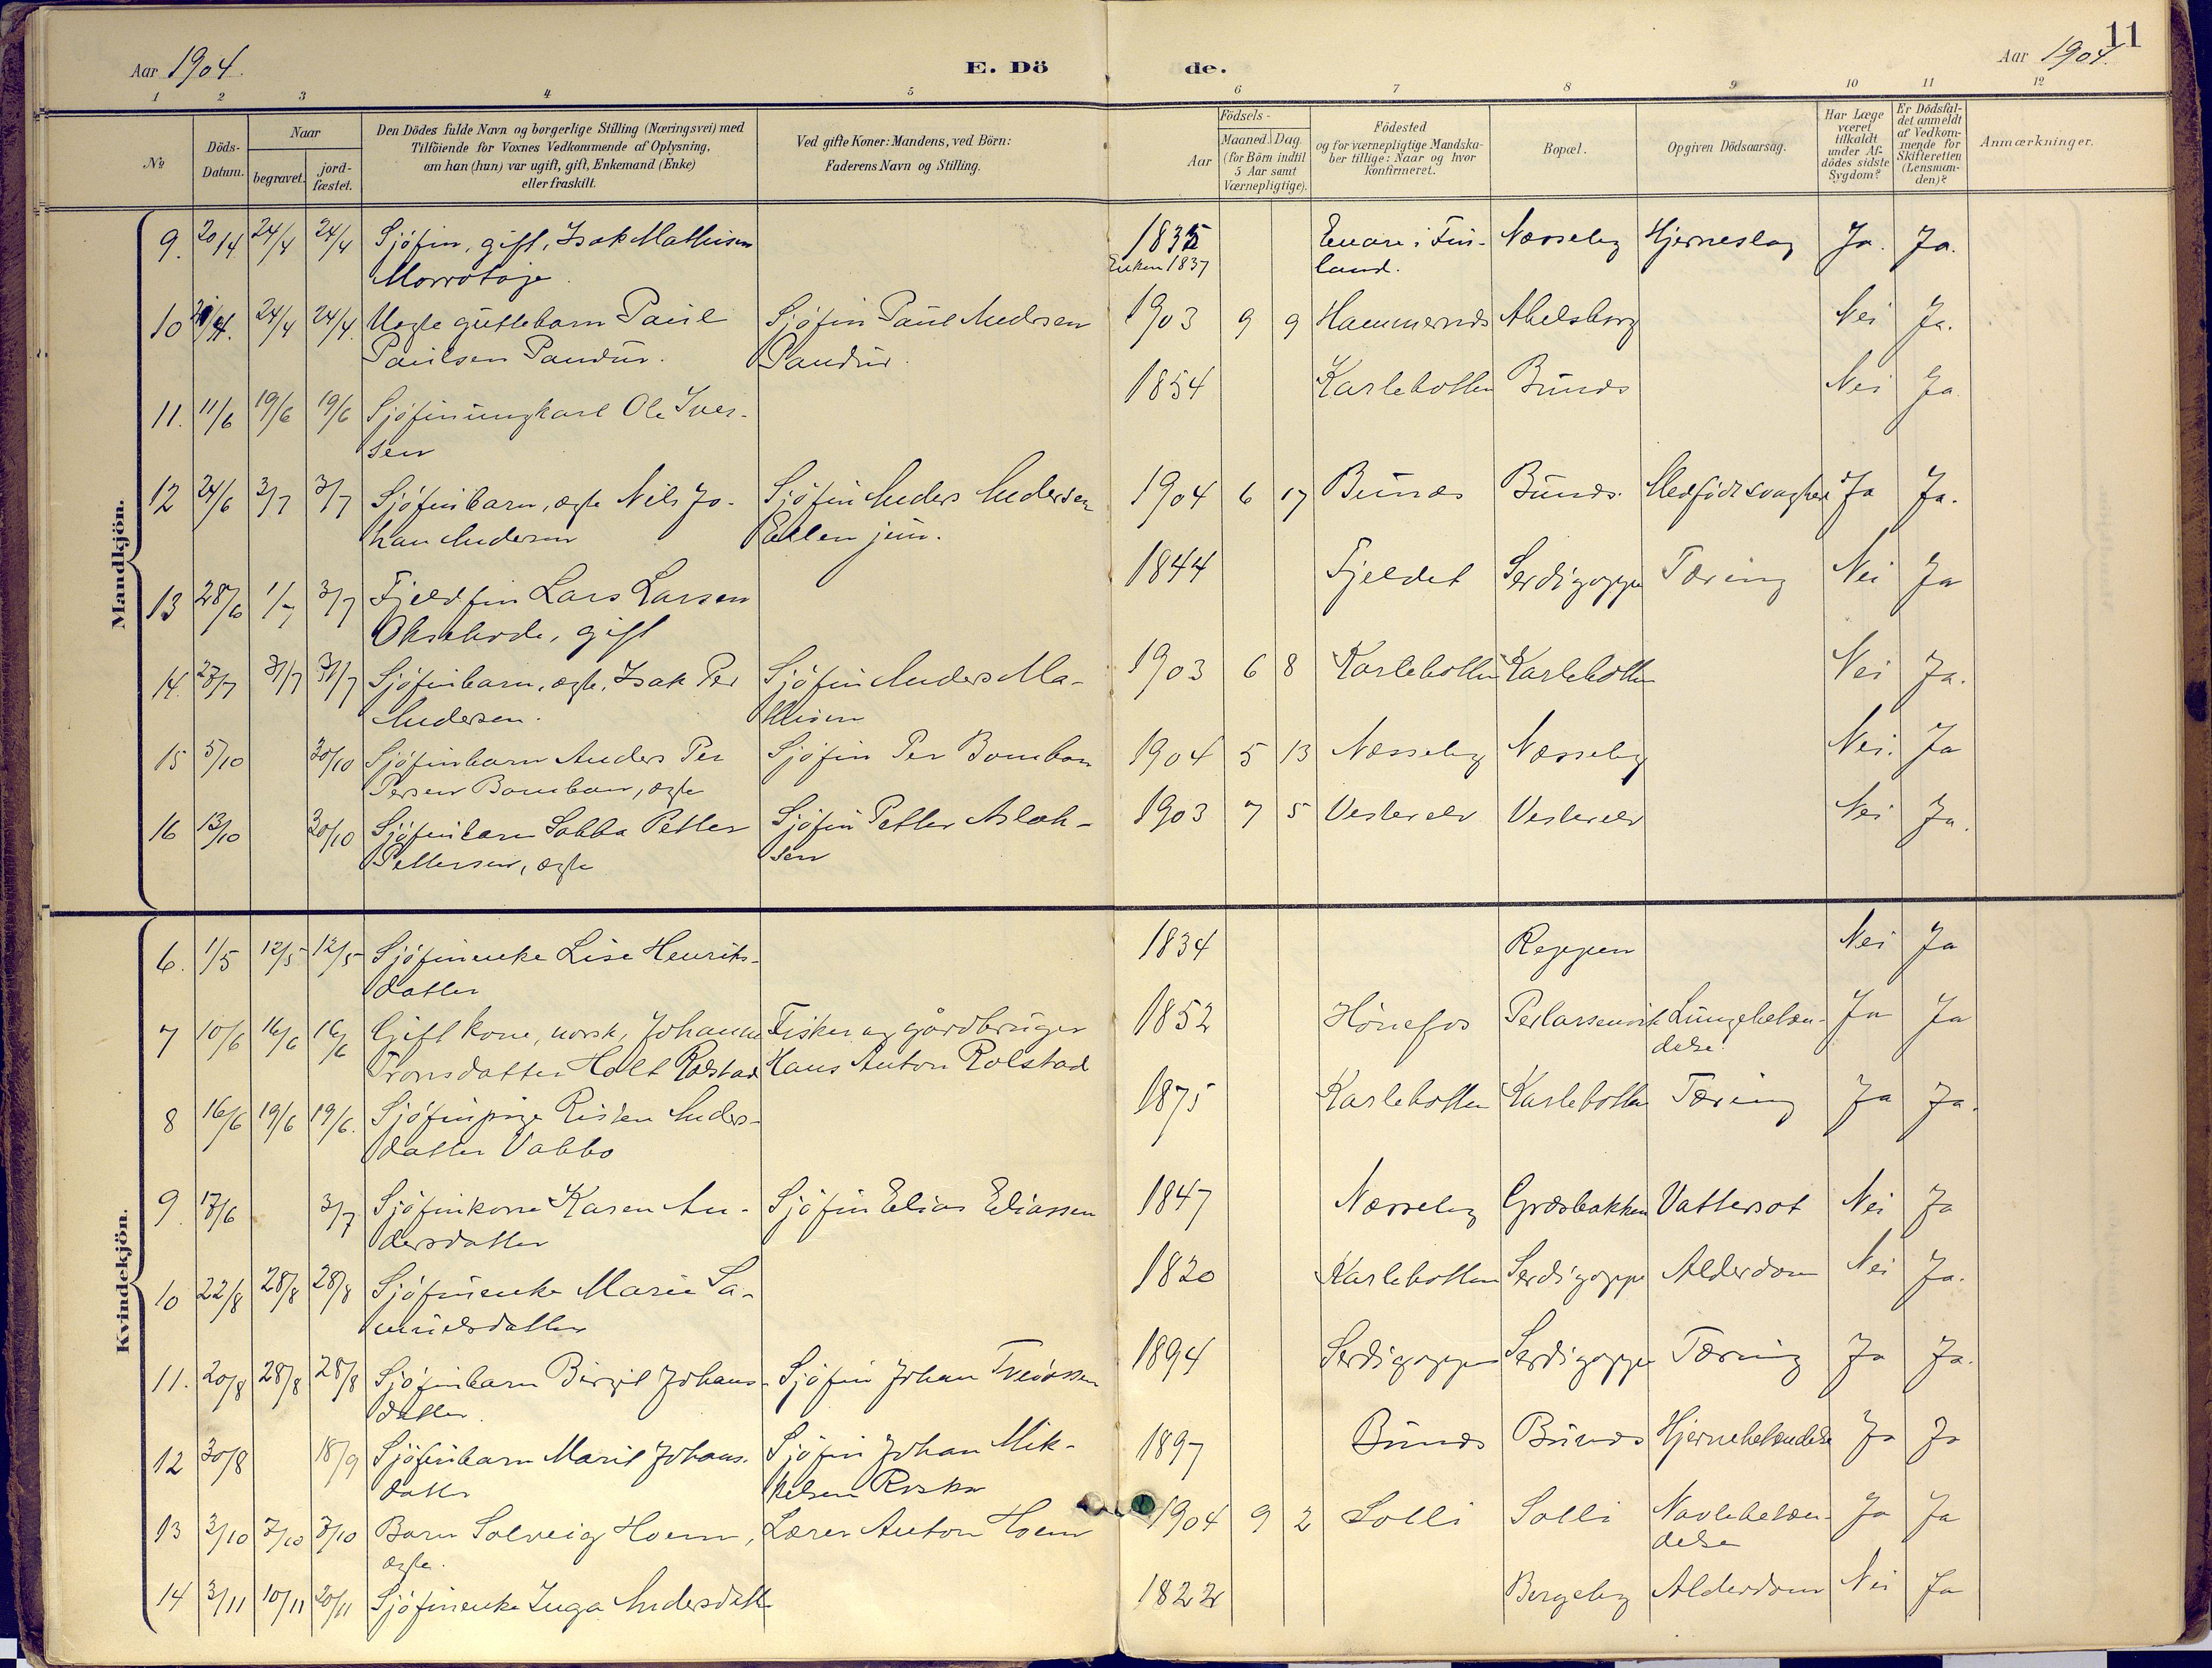 SATØ, Nesseby sokneprestkontor, H/Ha/L0007kirke: Ministerialbok nr. 7, 1898-1921, s. 11